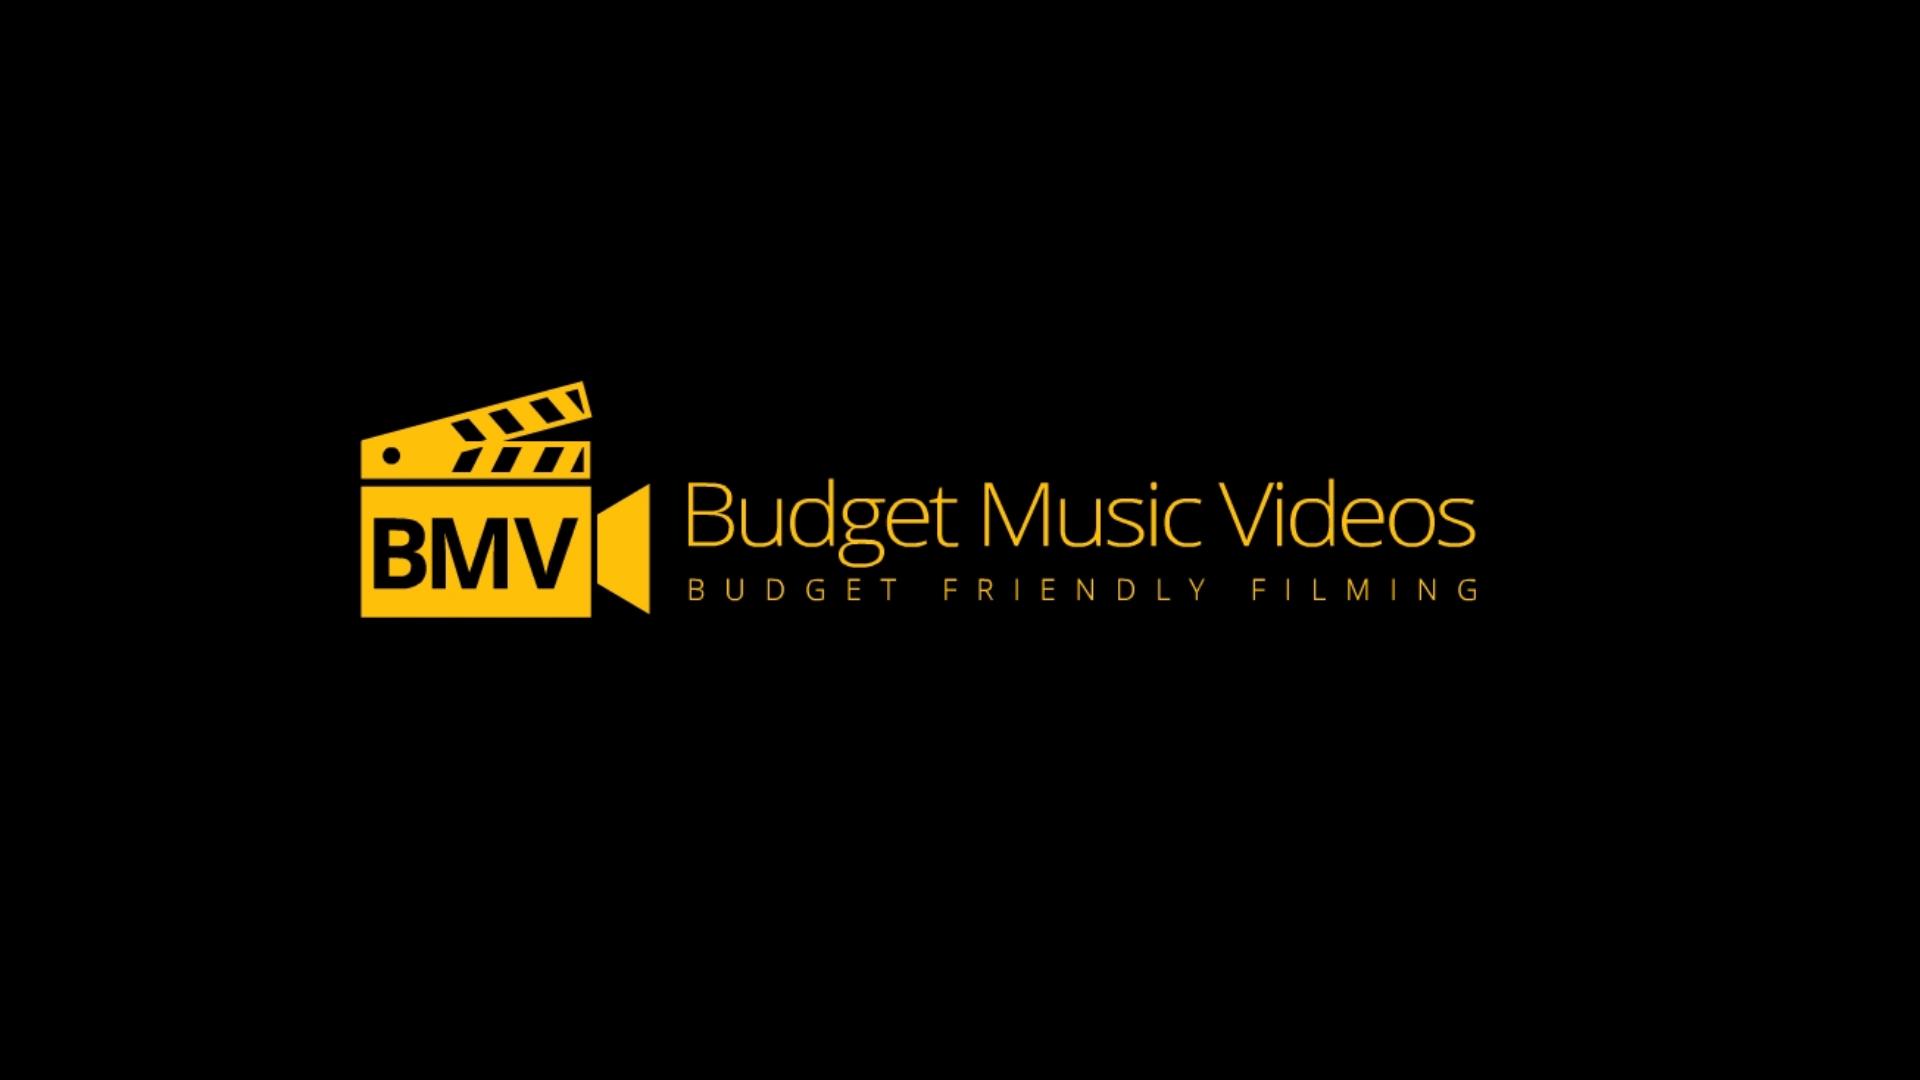 Budget Music Videos Logo